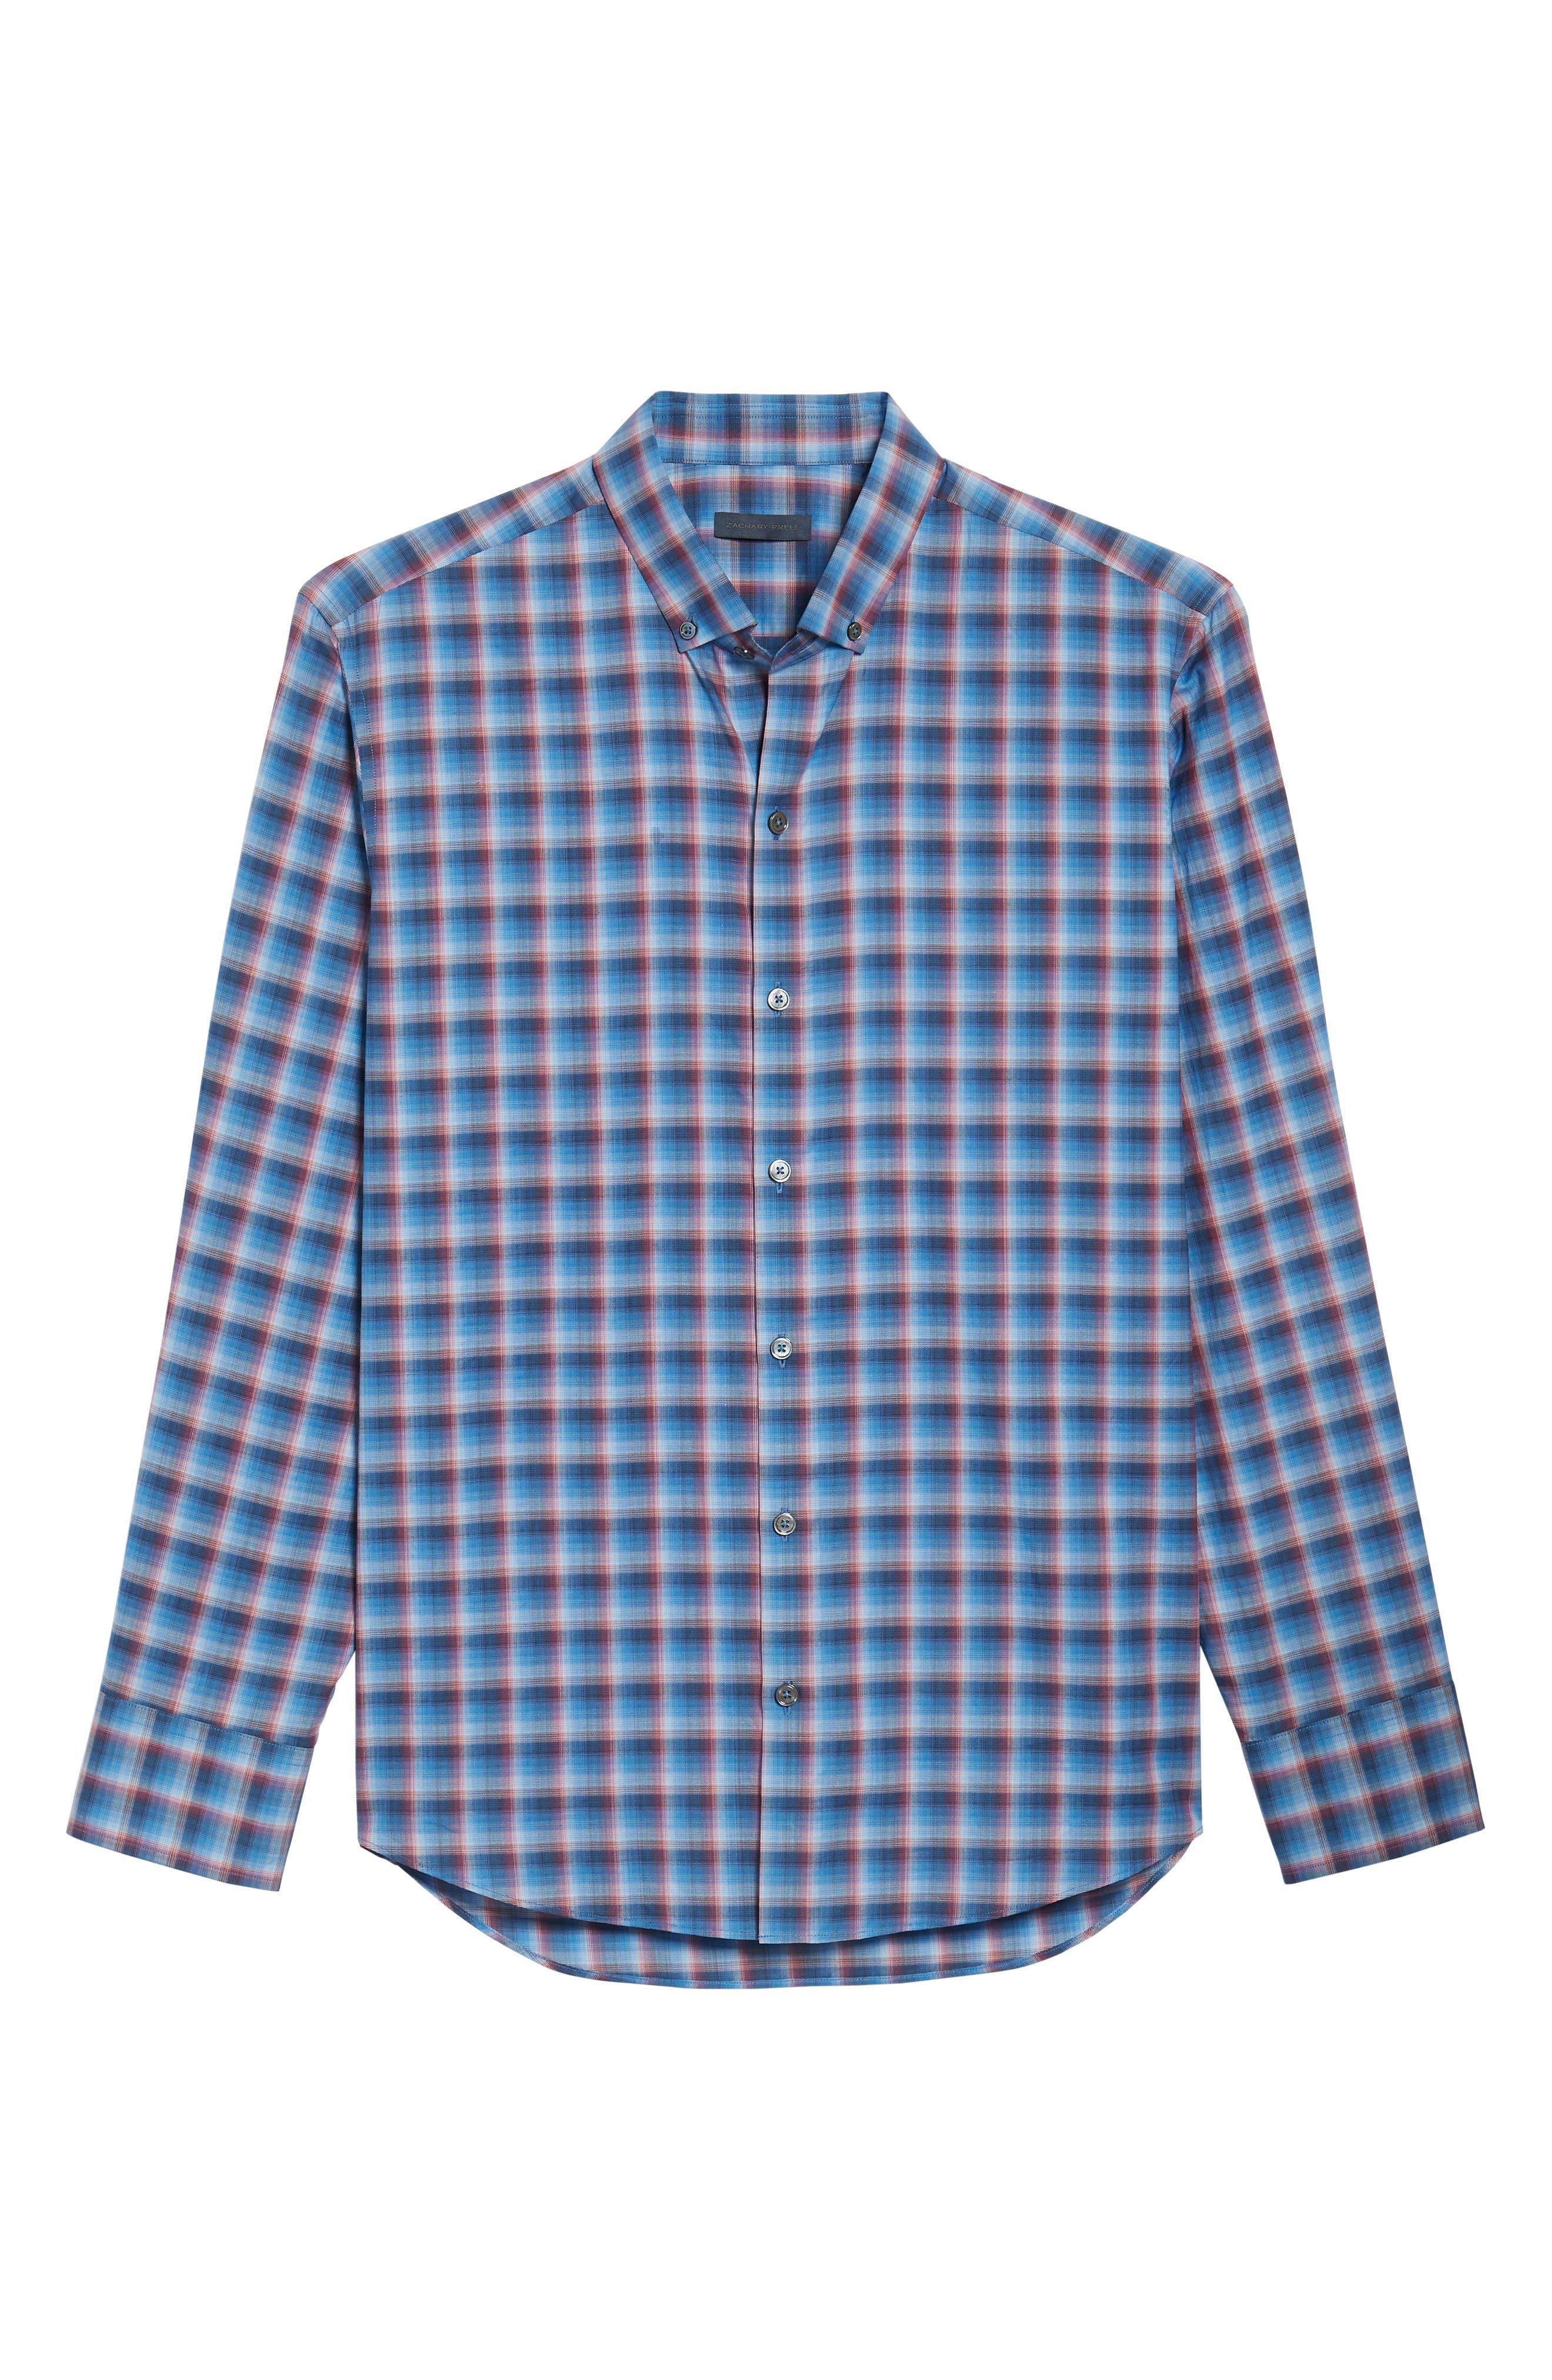 ZACHARY PRELL,                             Pinker Plaid Sport Shirt,                             Alternate thumbnail 6, color,                             401